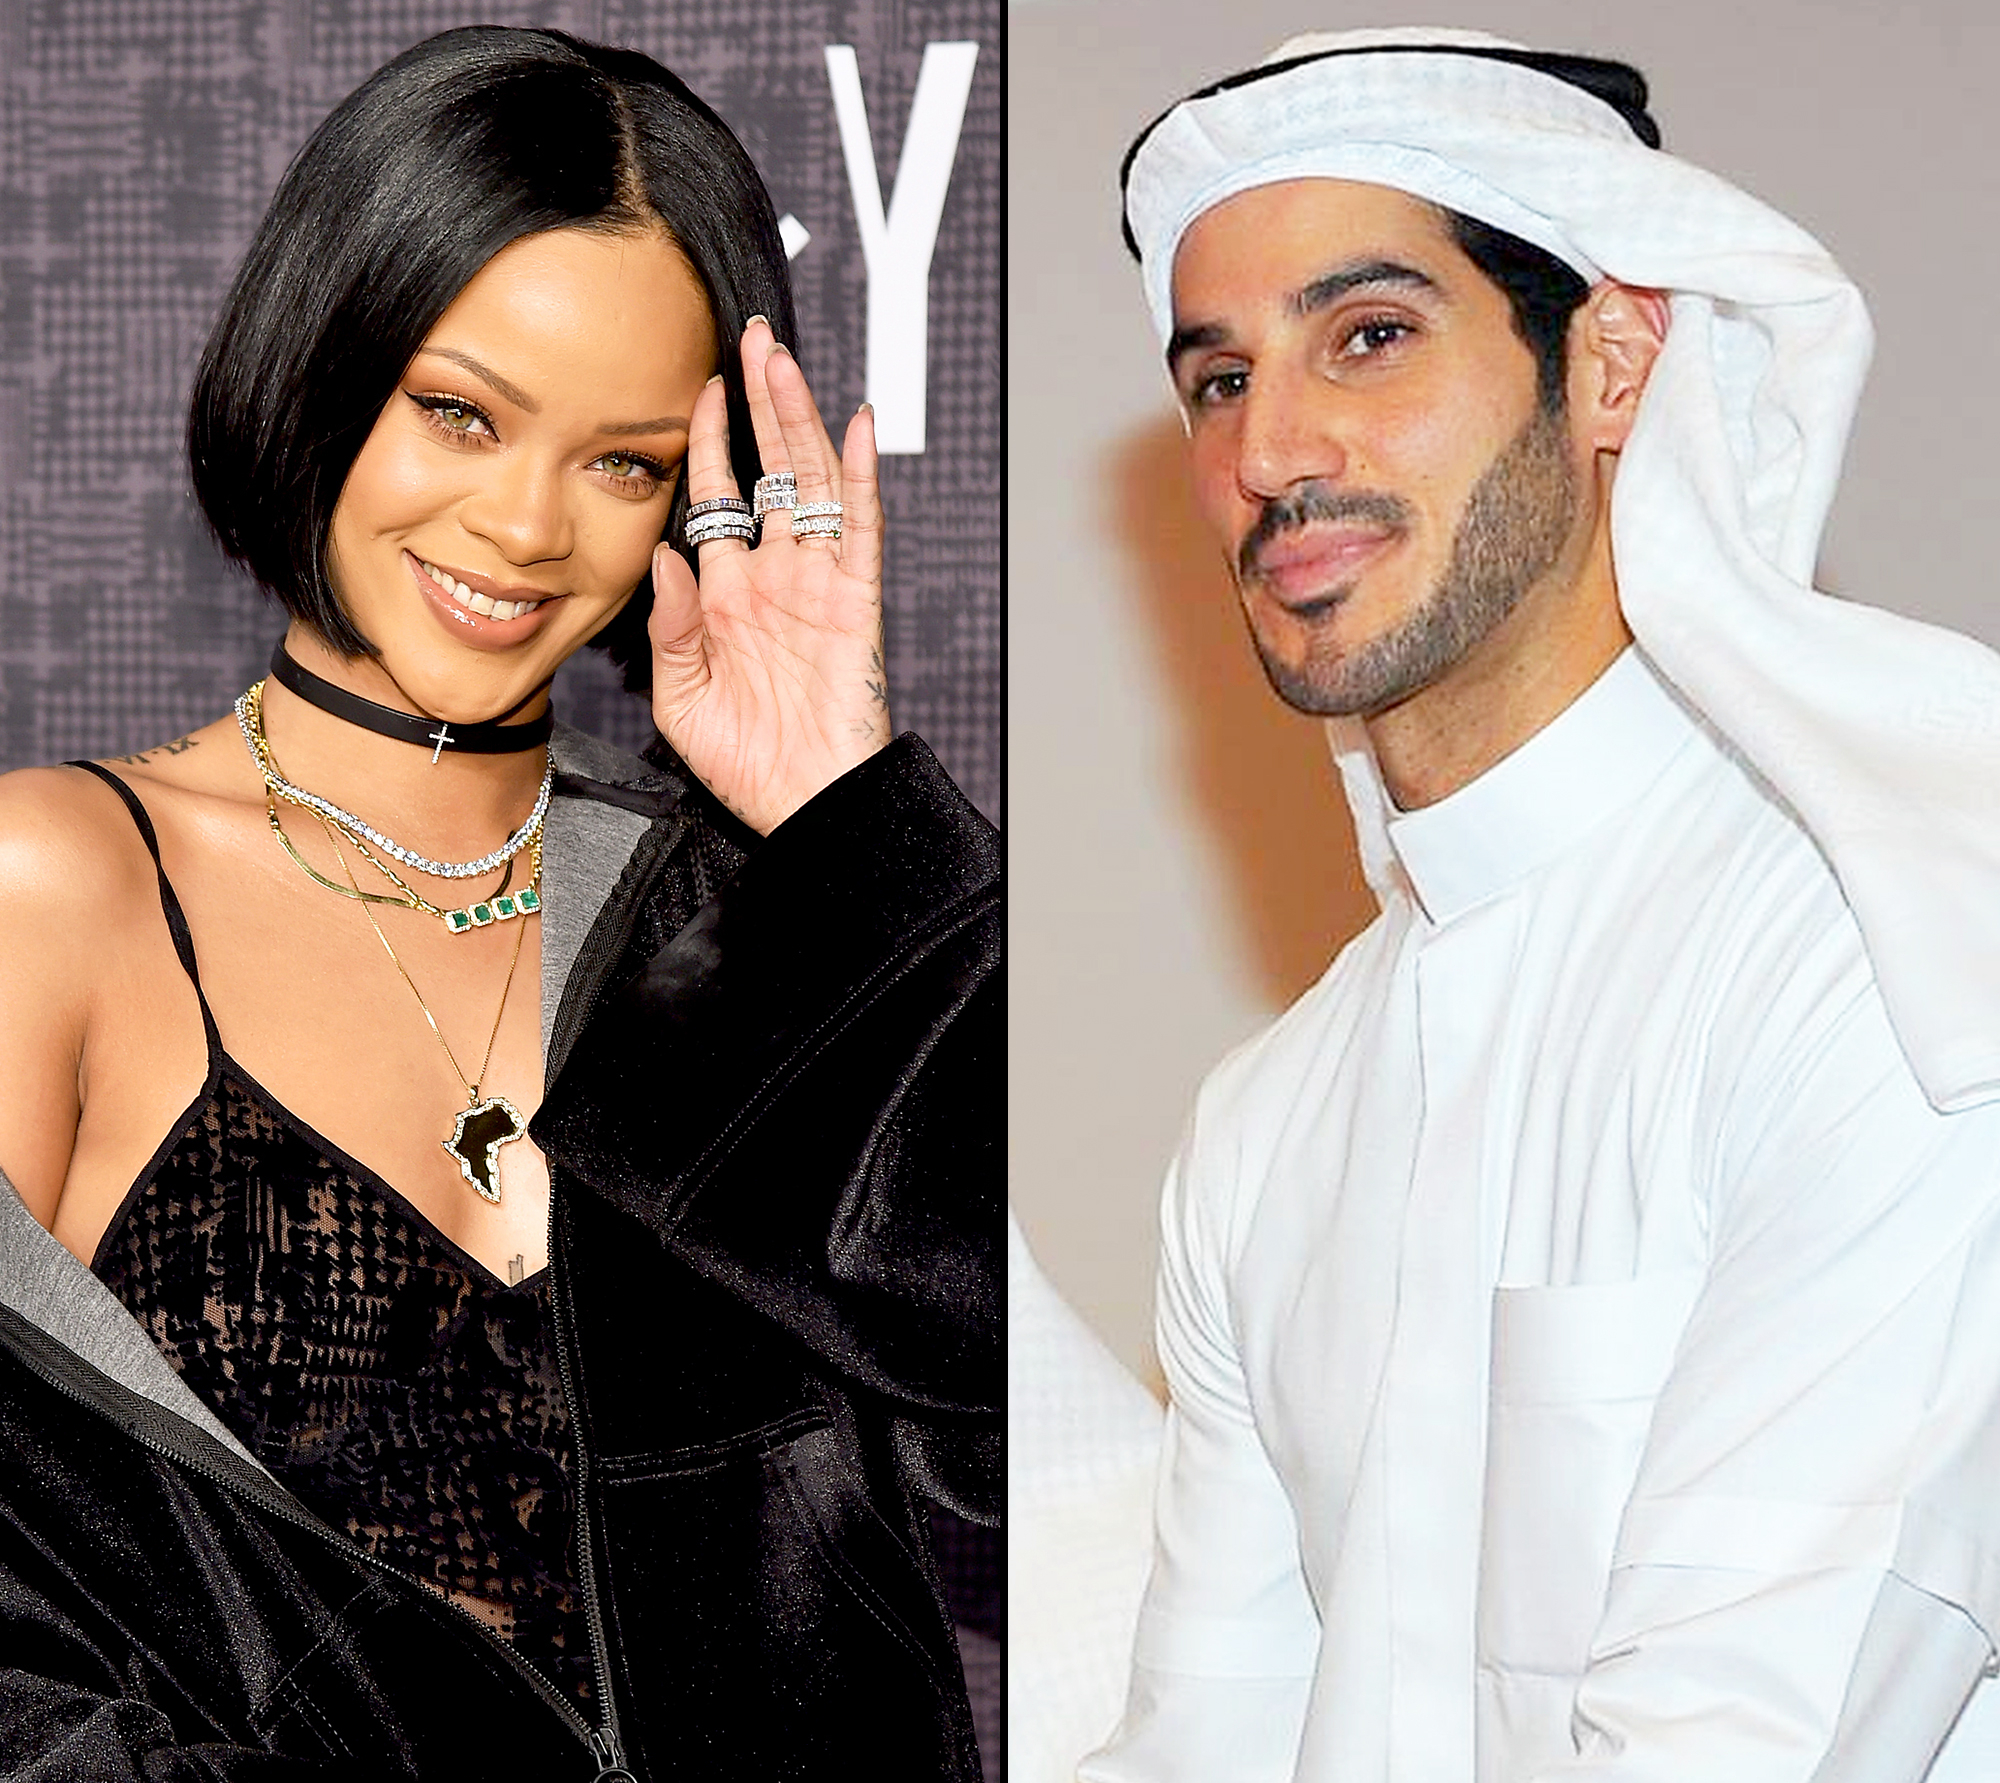 Rihanna Hassan Jameel Boyfriend Dating